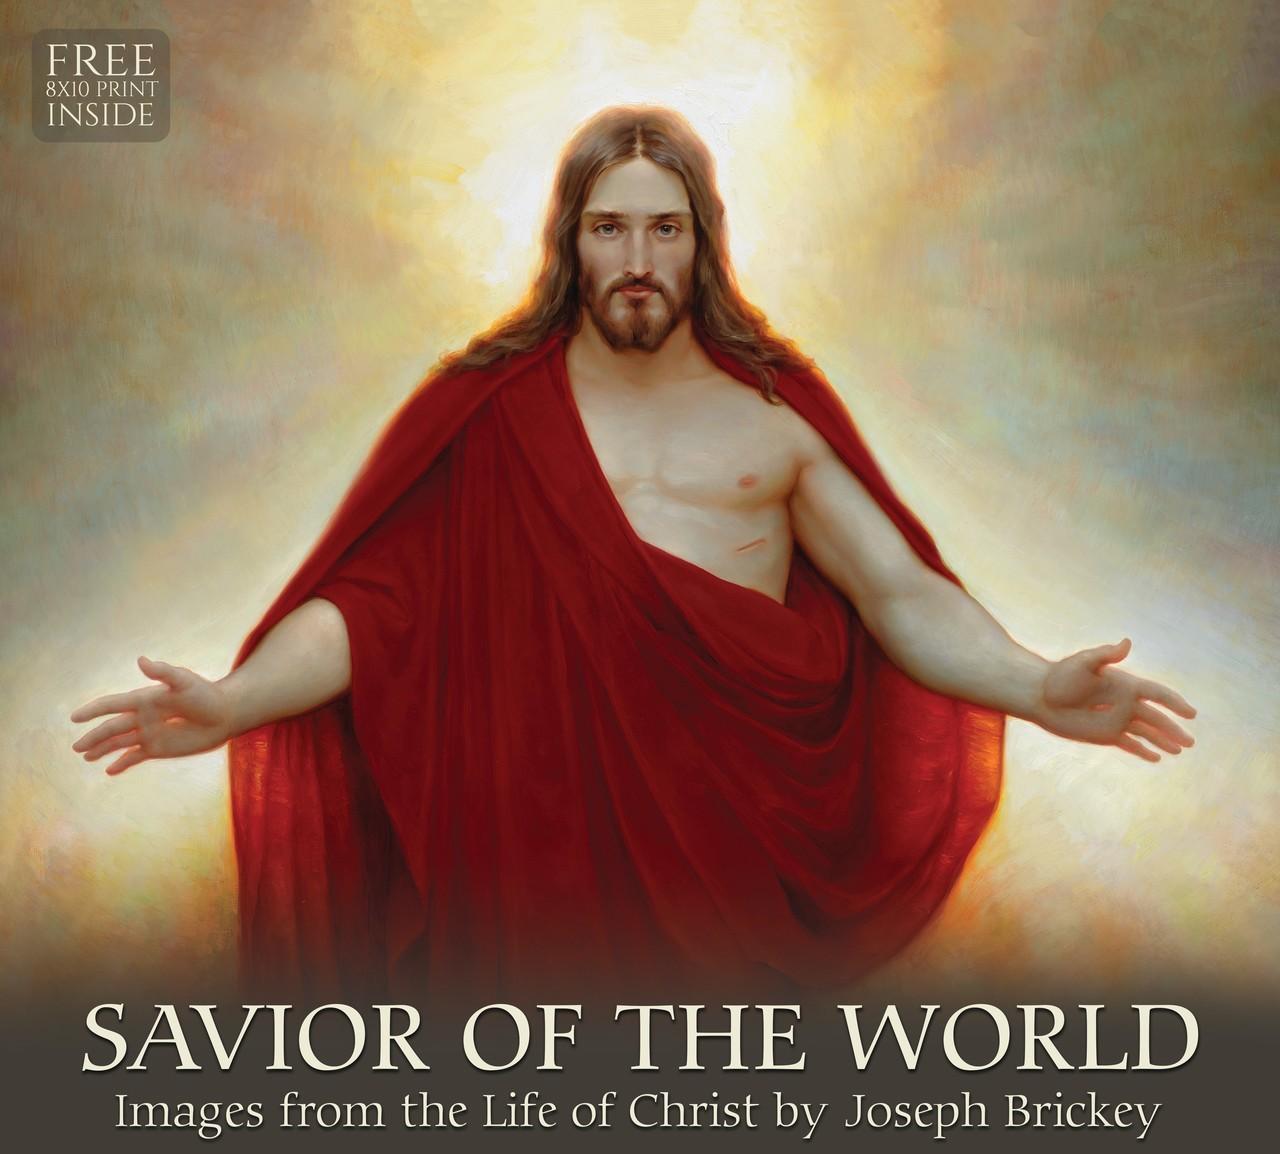 2019 Savior of the World Calendar - Joseph Brickey - AFA-JBCAL2019